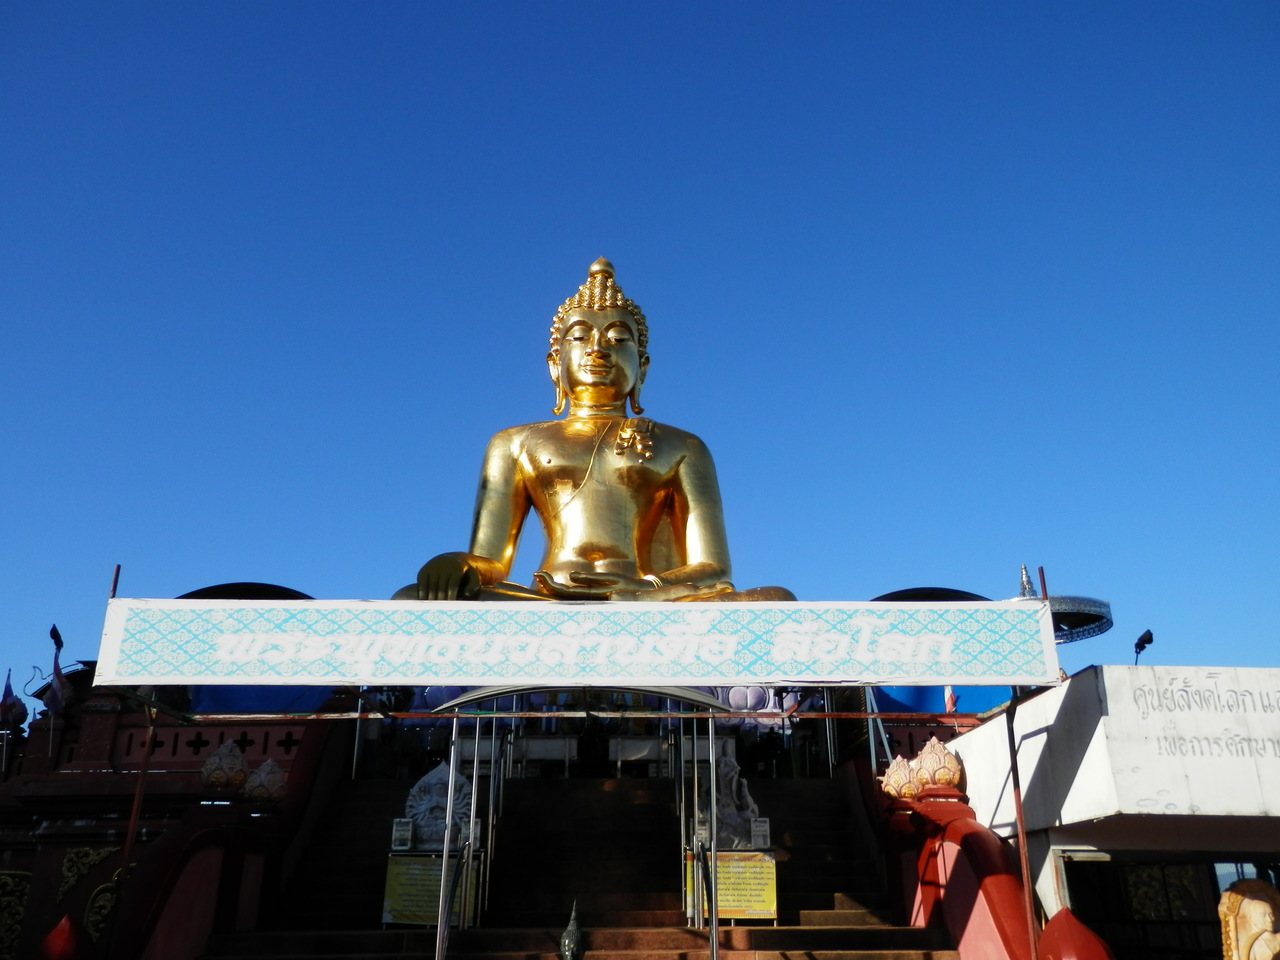 Phra Chiang Saen Si Phaendin Chiang Rai